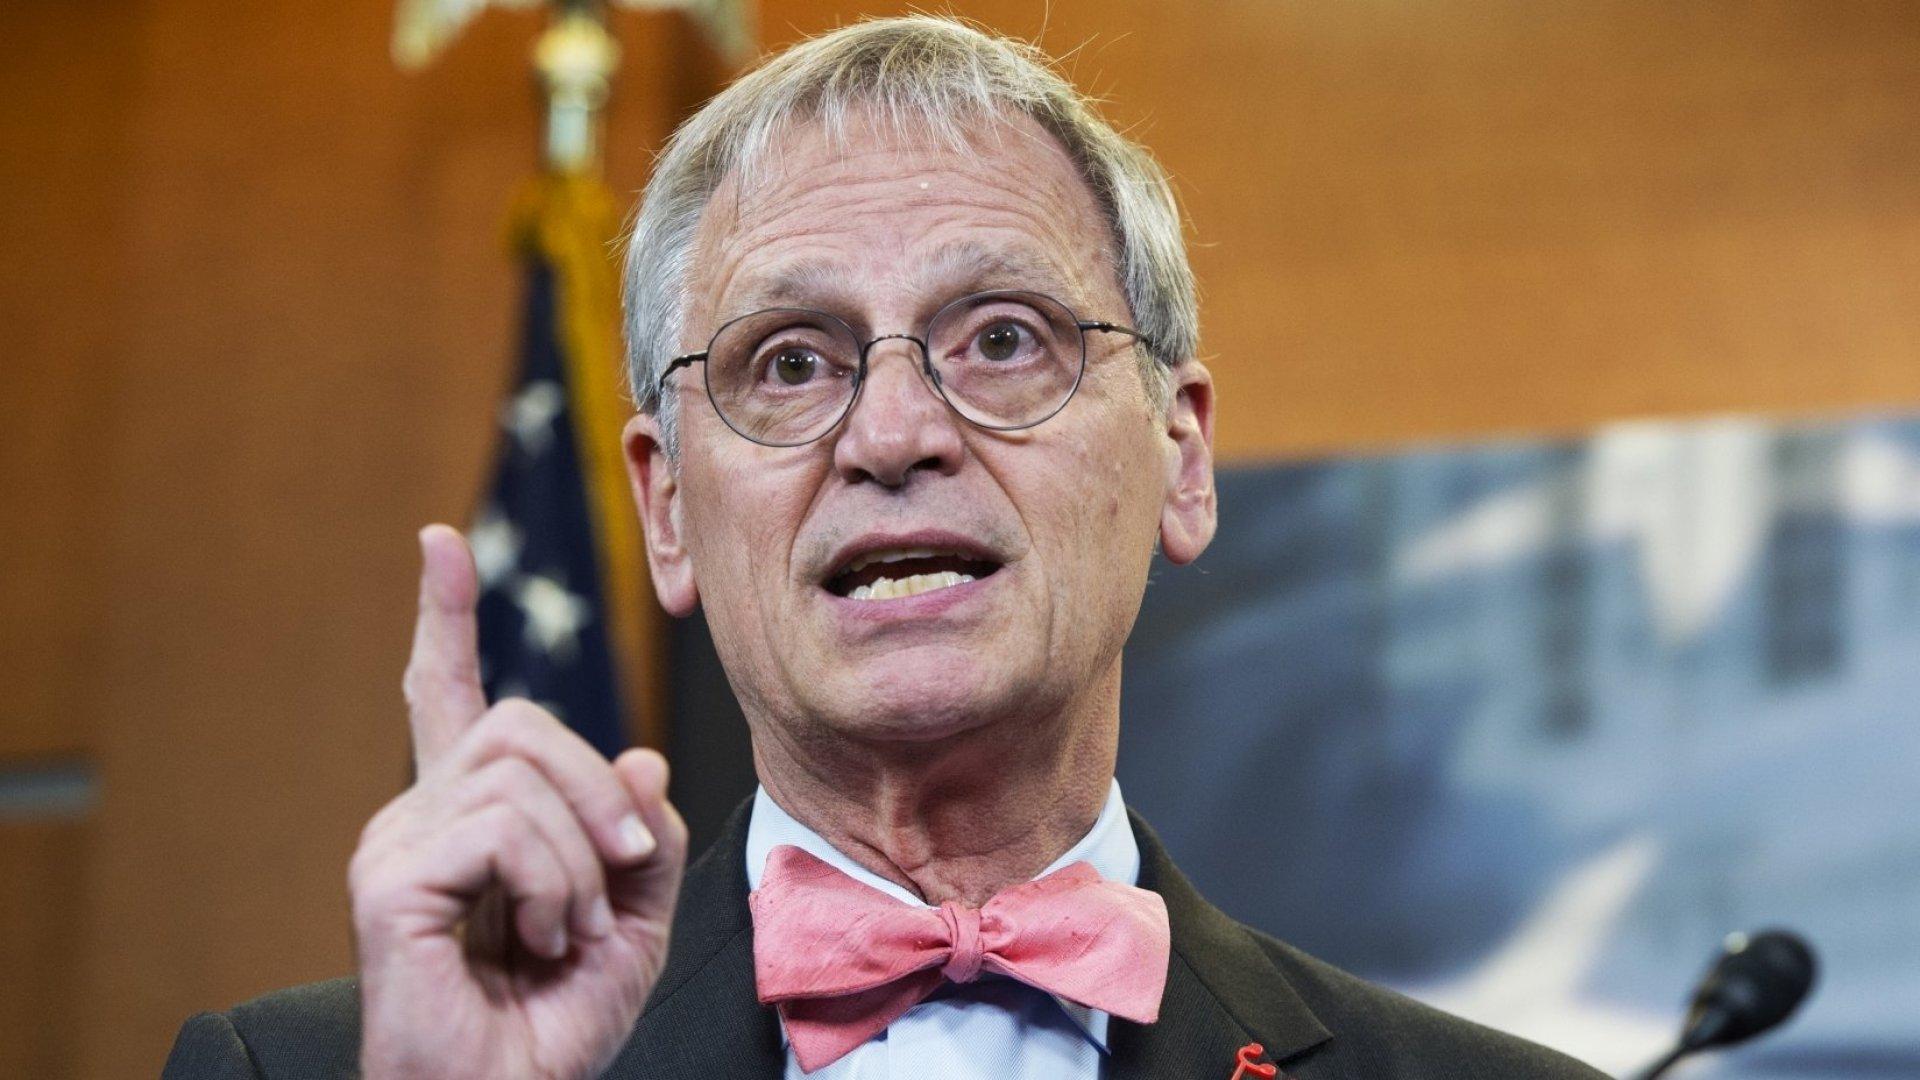 Rep. Earl Blumenauer, D-Oregon, has been fighting for marijuana reform for decades.